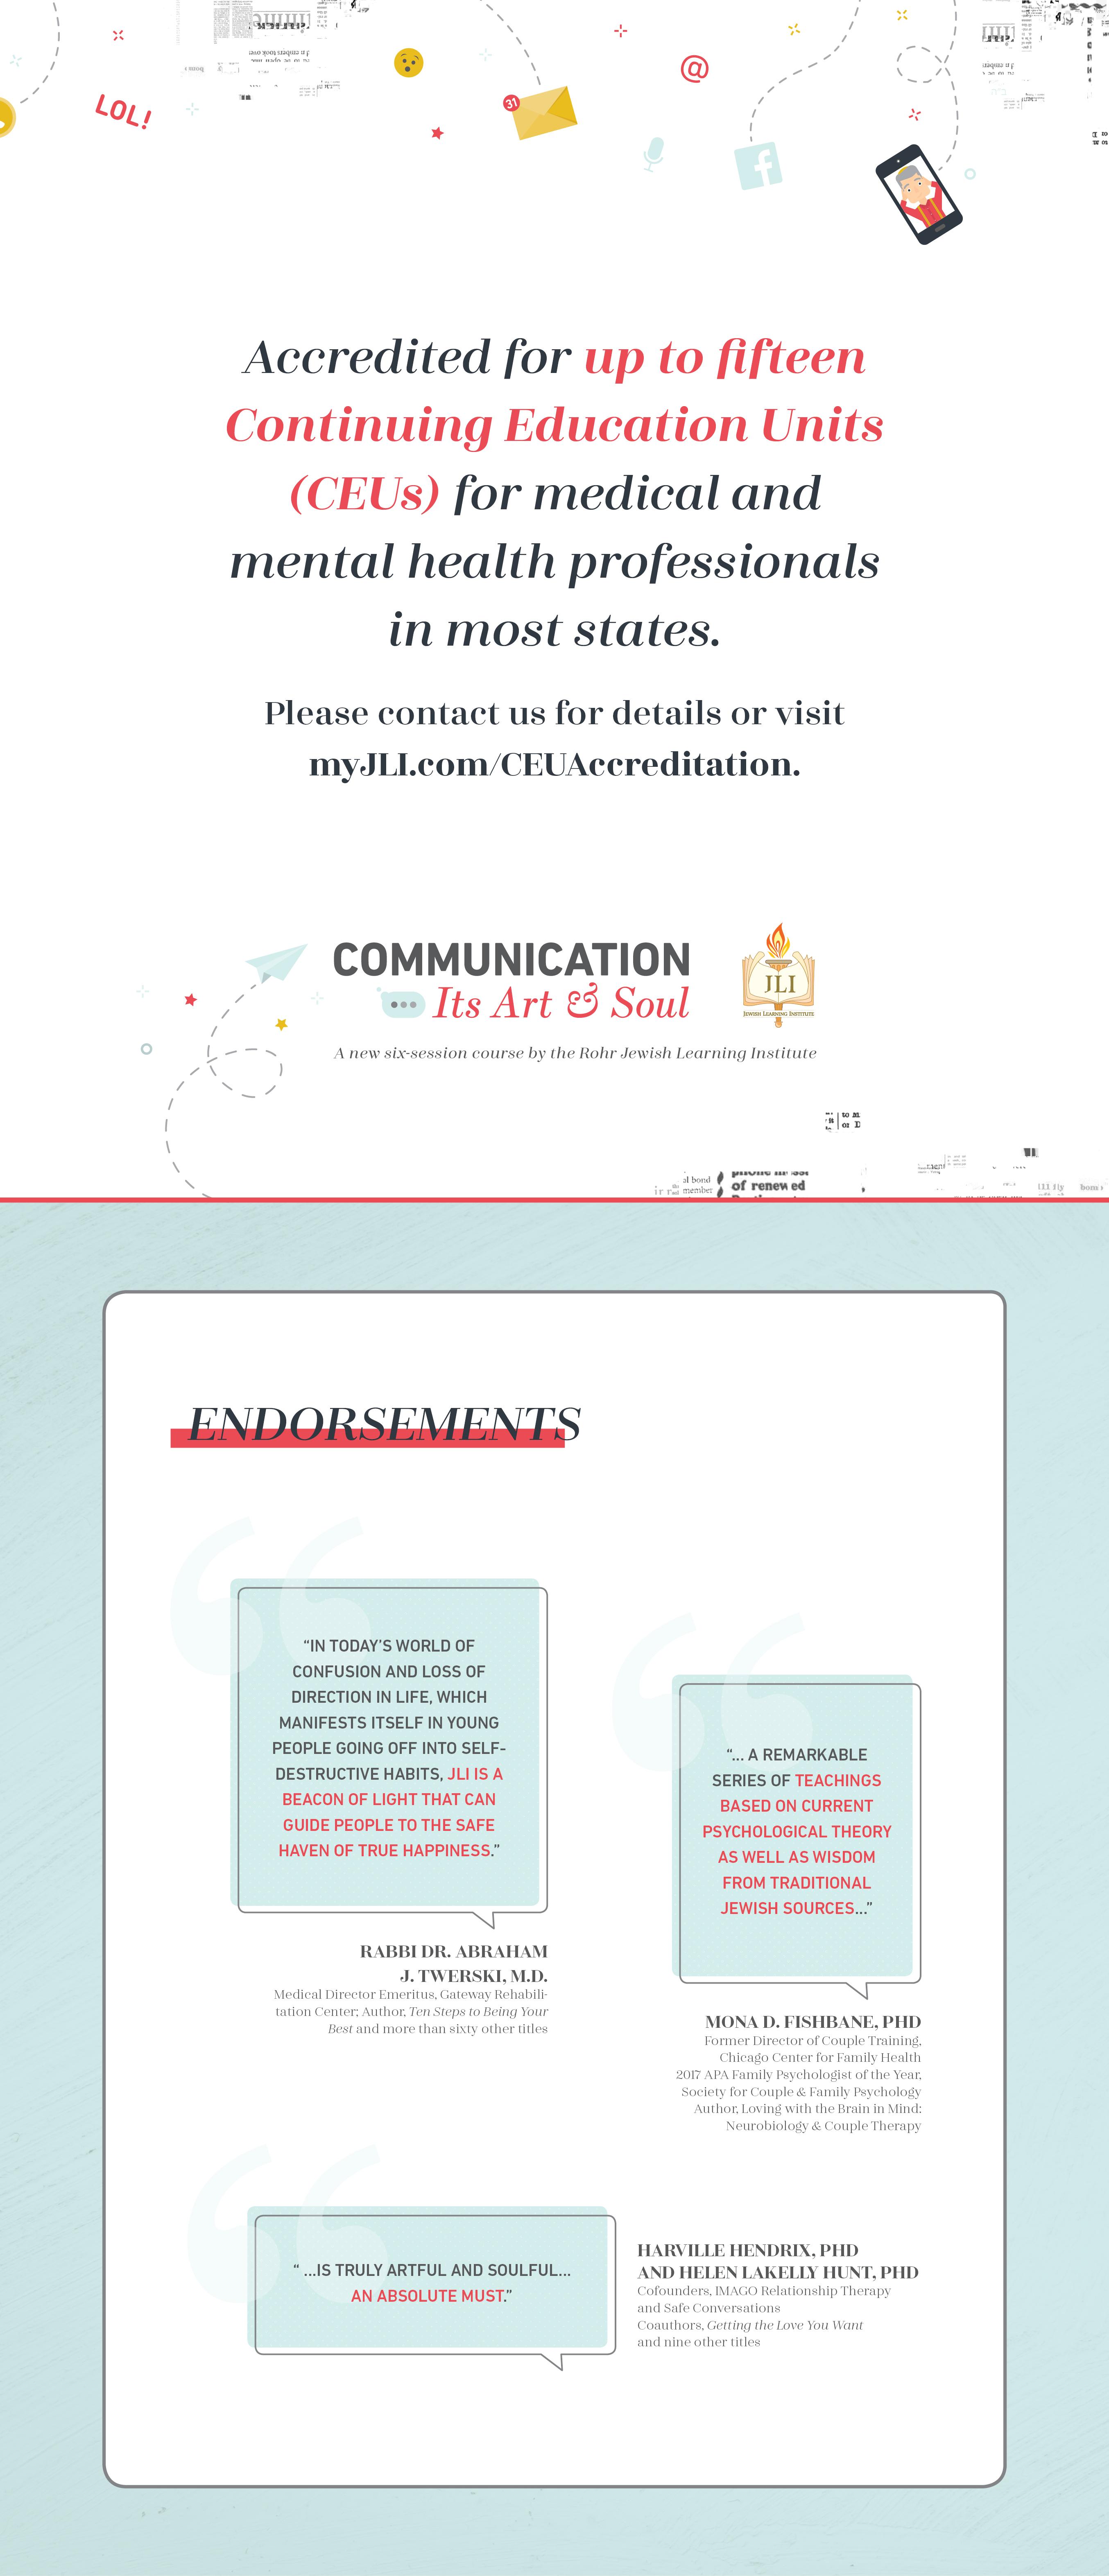 Communication_Accreditation_endorsements.jpg